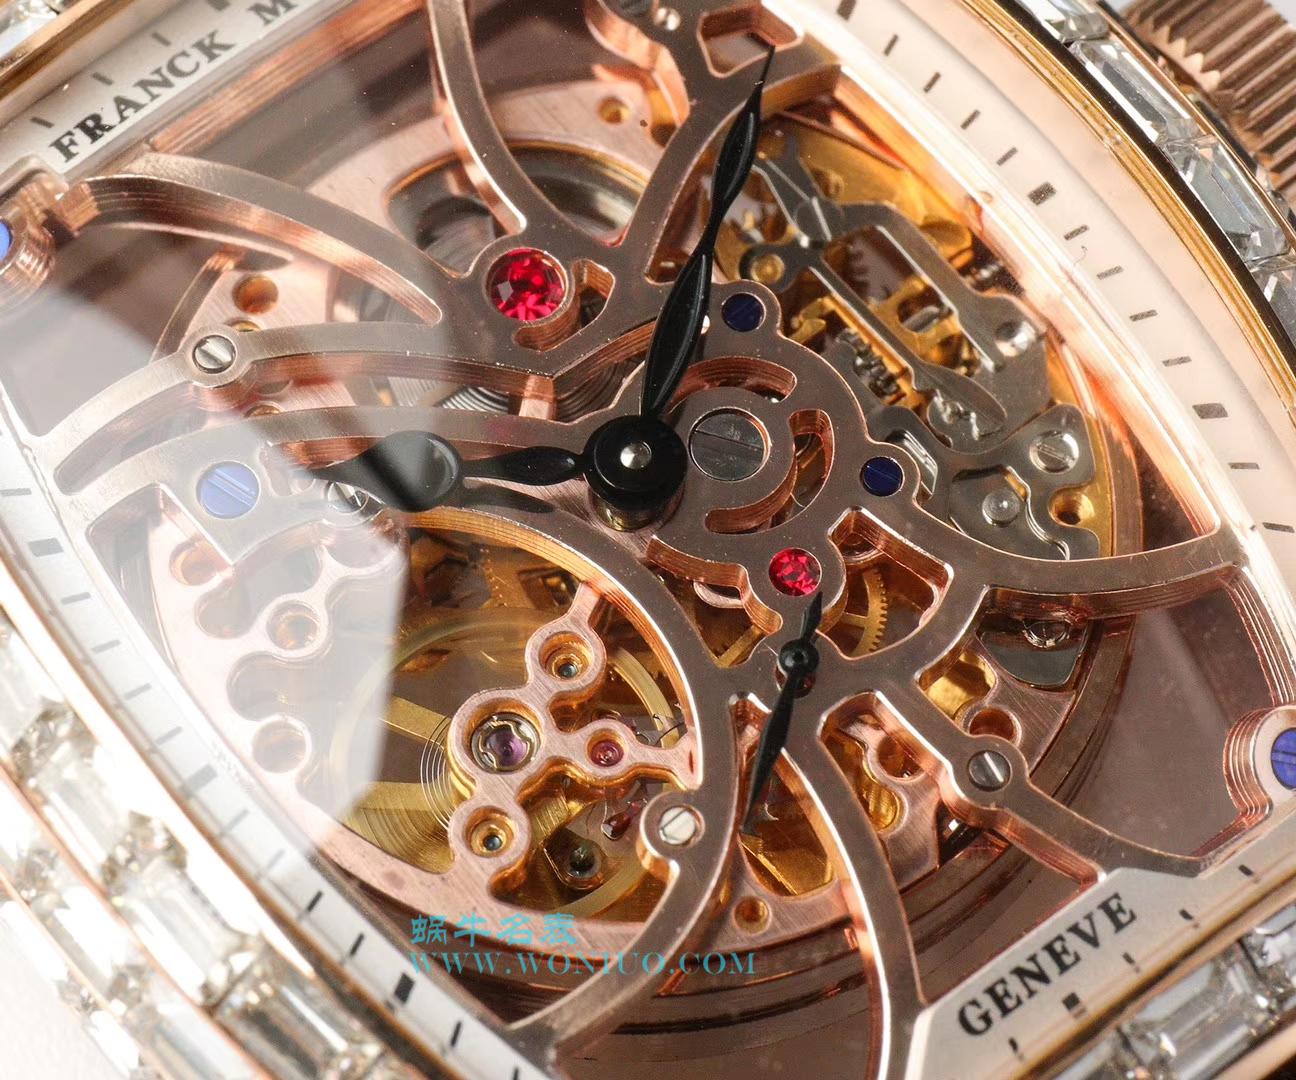 【UF一比一超A高仿手表】法兰克穆勒MEN'S COLLECTION系列8880  新品珍藏版方钻新款 / FL025